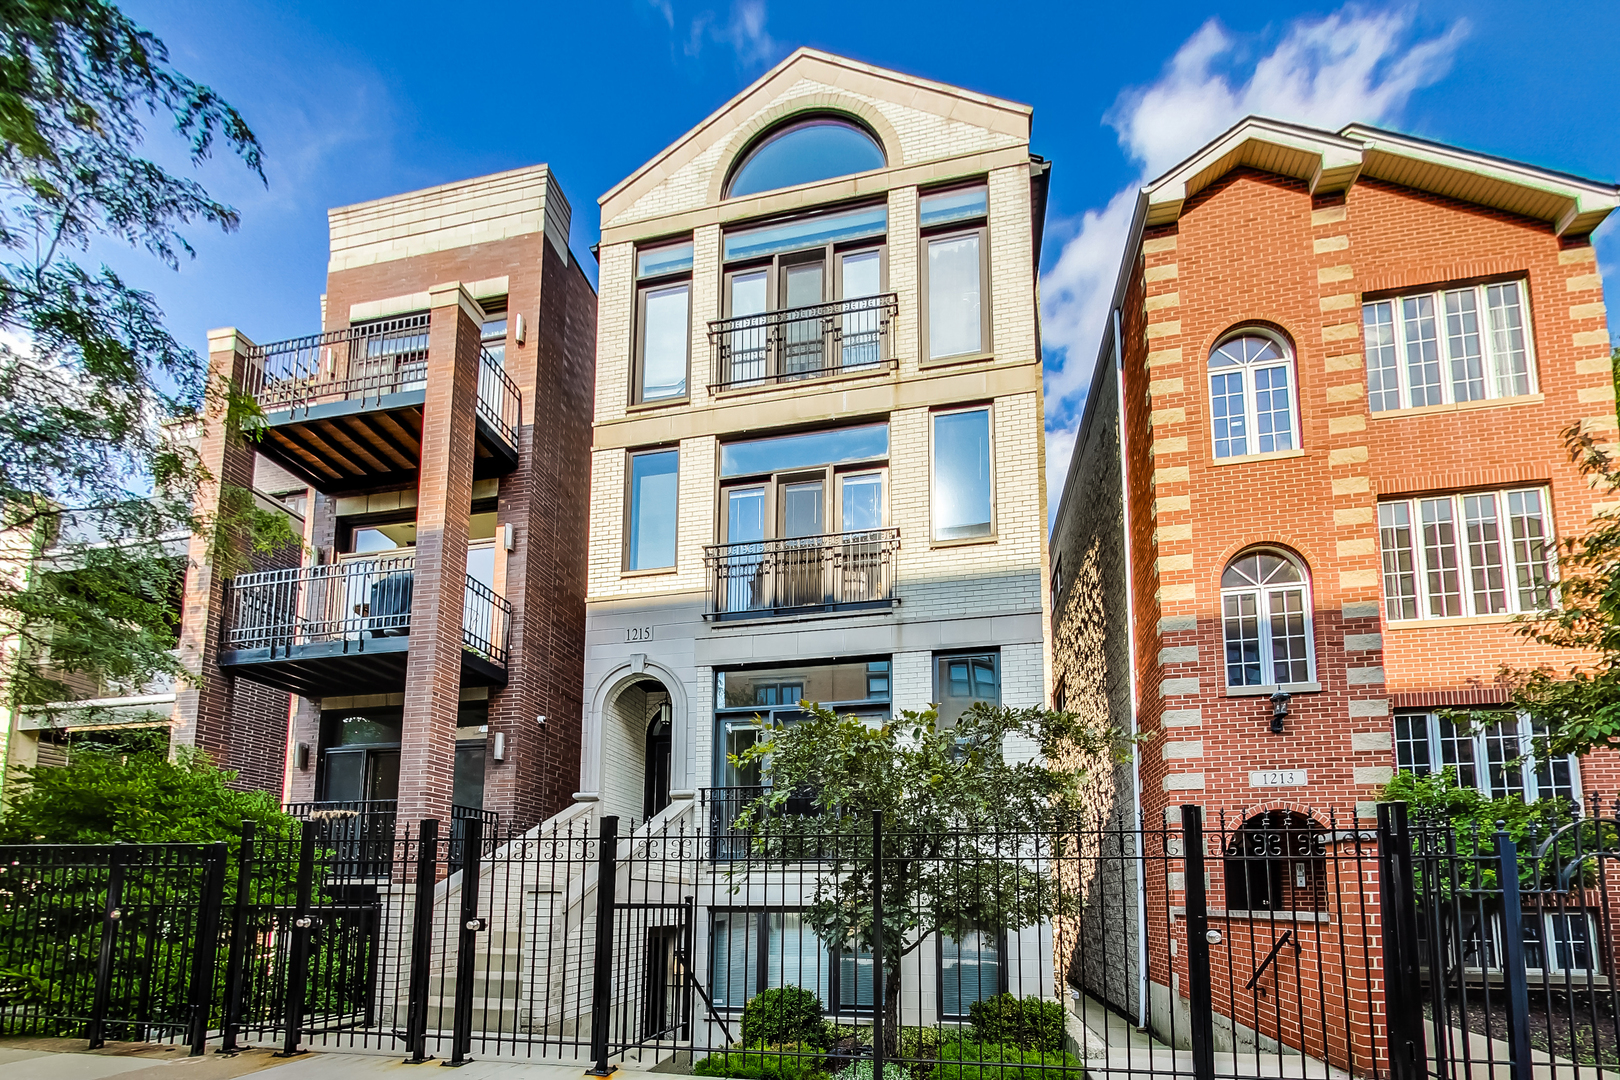 1215 N Cleaver St apartments for rent at AptAmigo